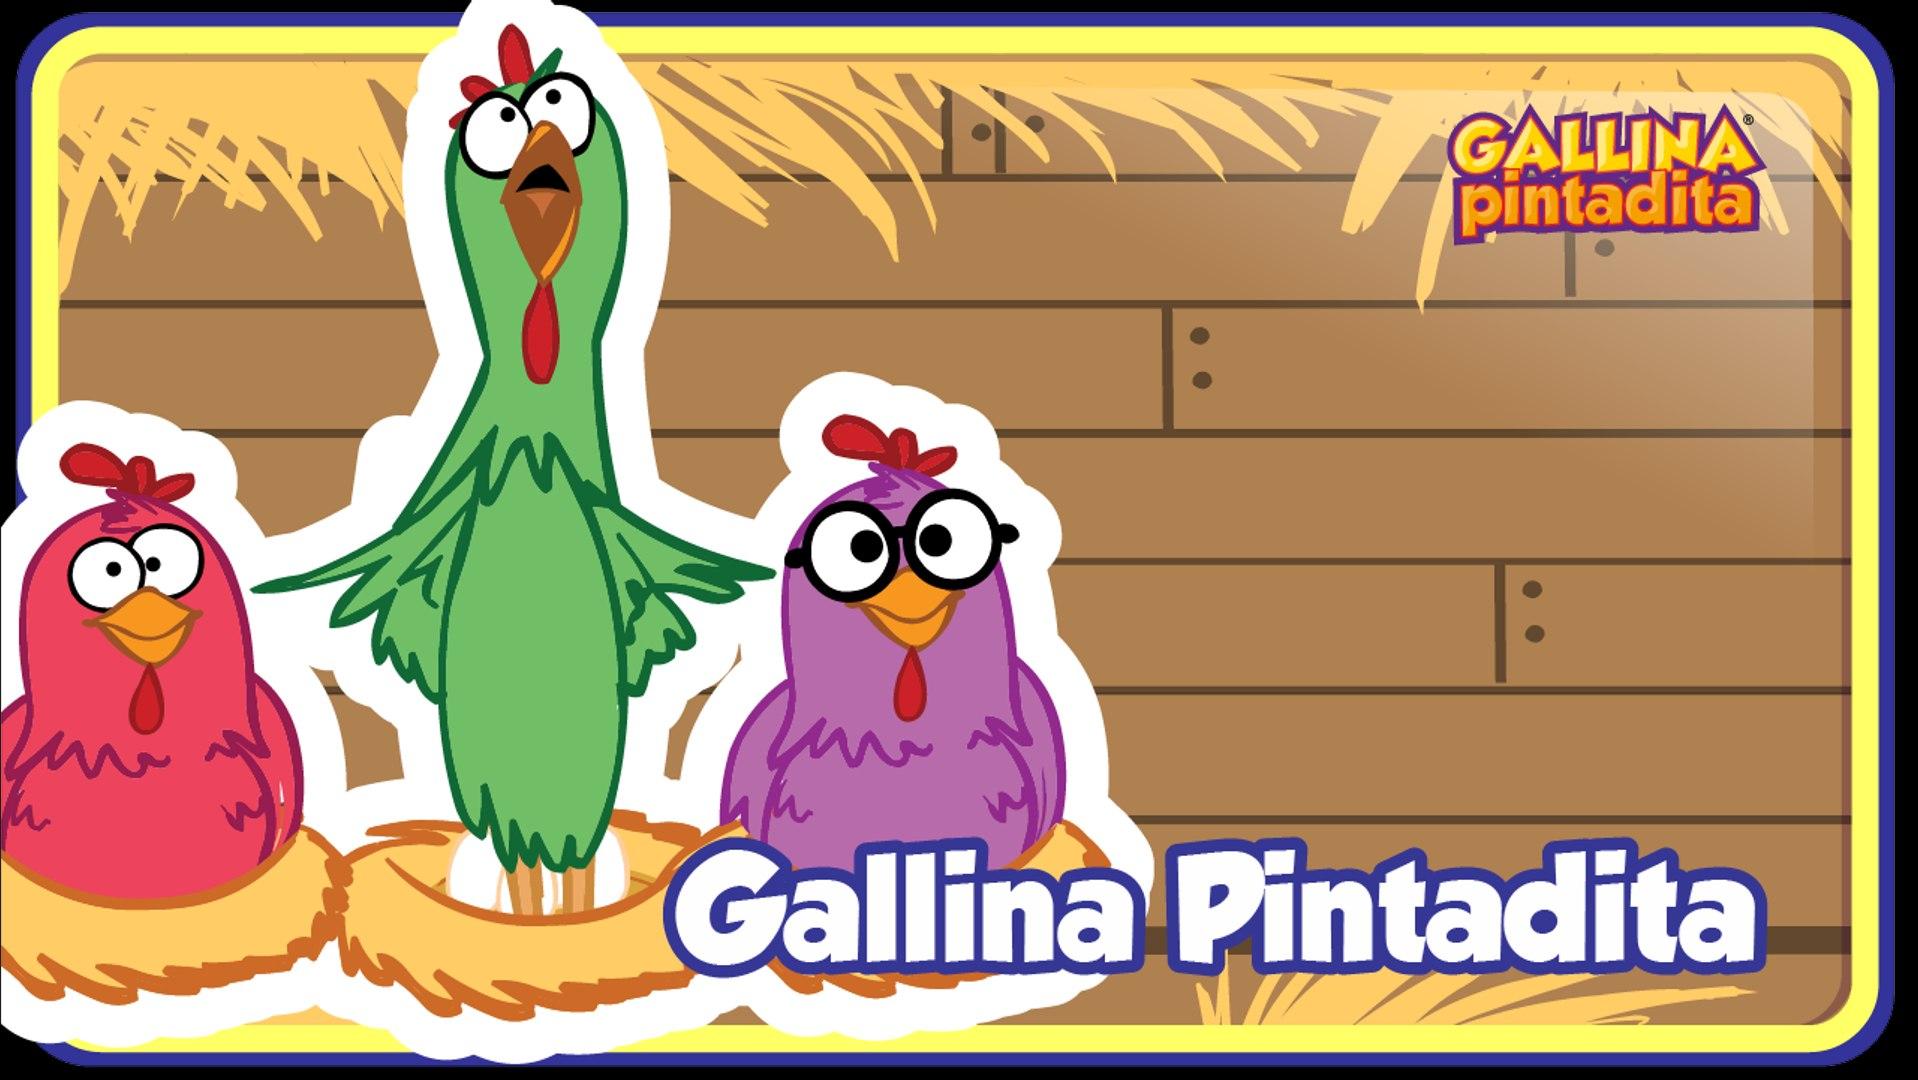 Gallina Pintadita Gallina Pintadita 1 Oficial Lottie Dottie Chicken Español Vídeo Dailymotion